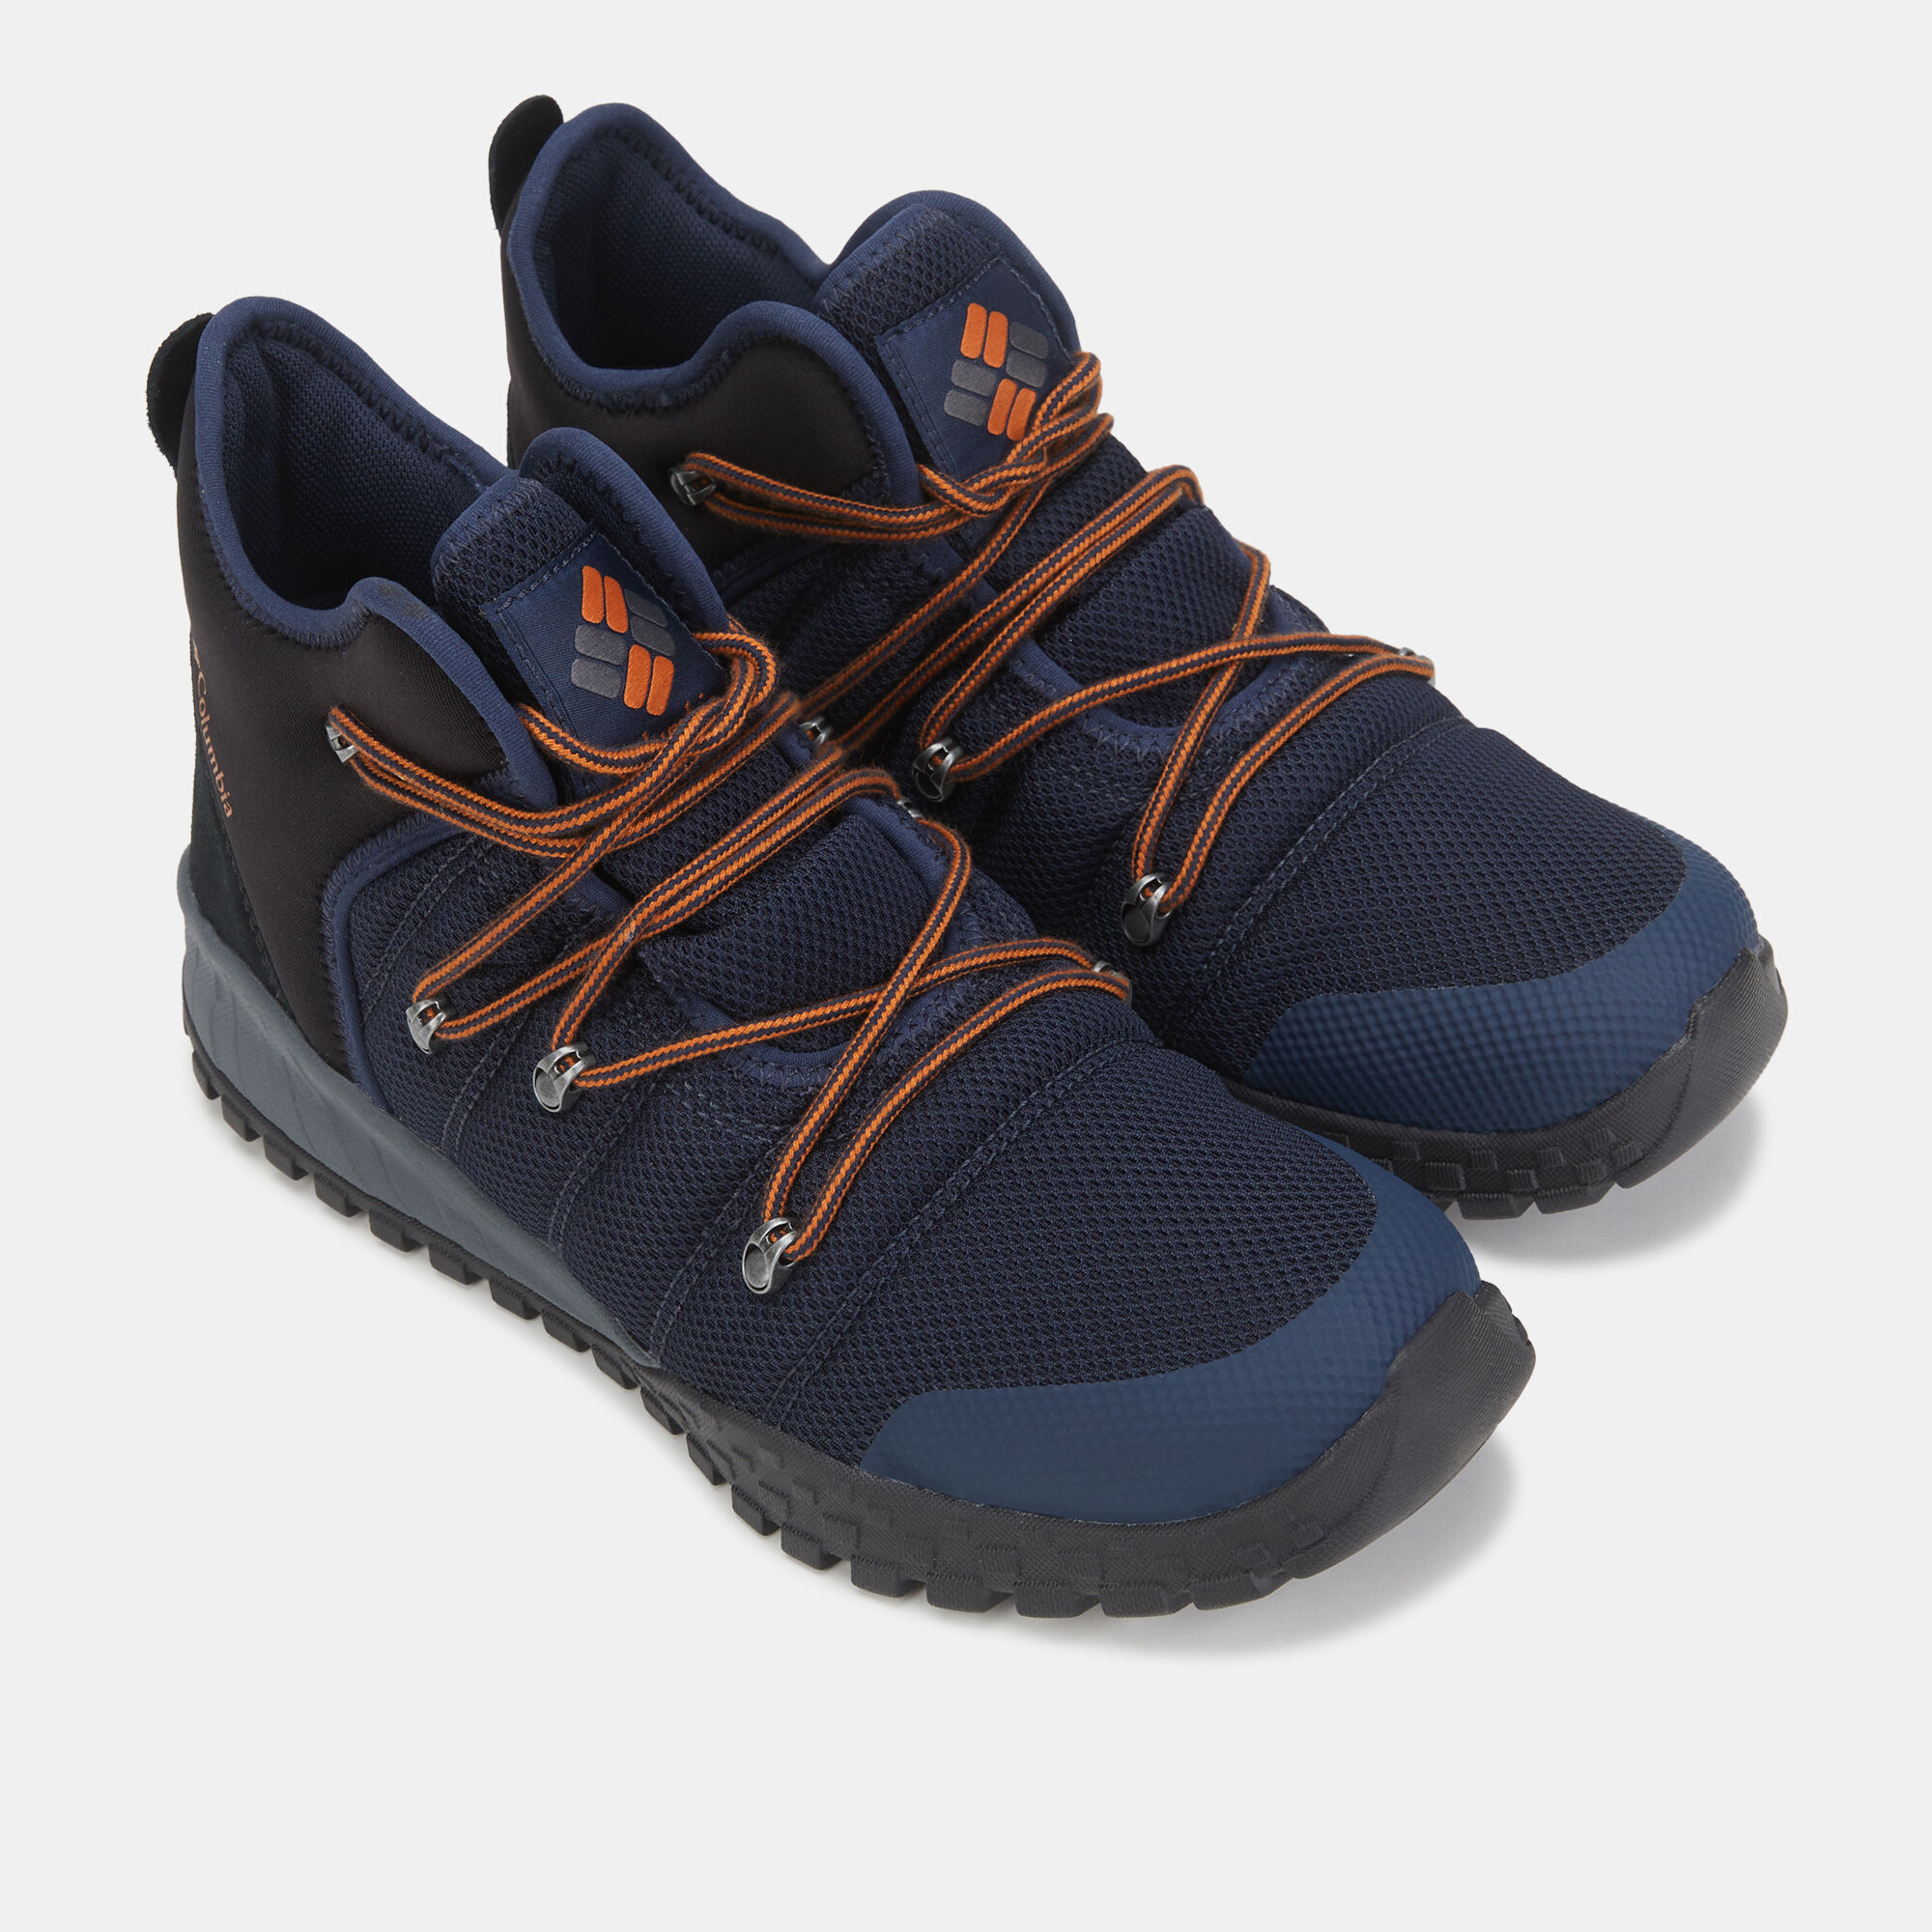 Buy Columbia Fairbanks 503 Mid Shoe in